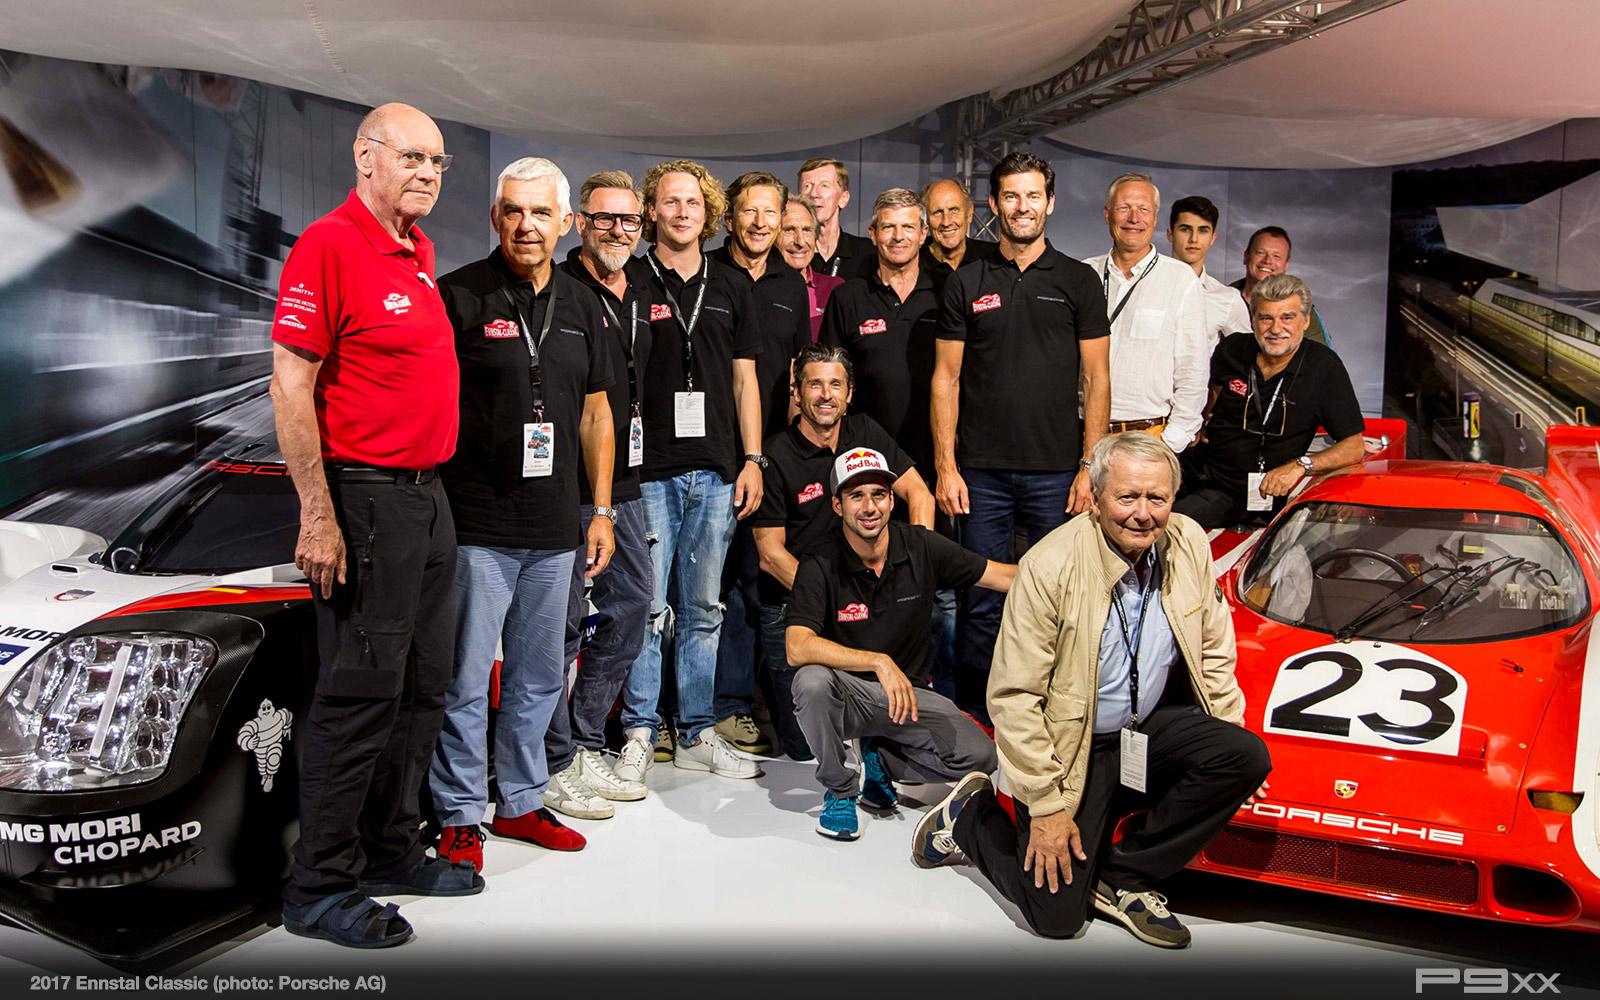 2017-Ennstal-Classic-Porsche-672